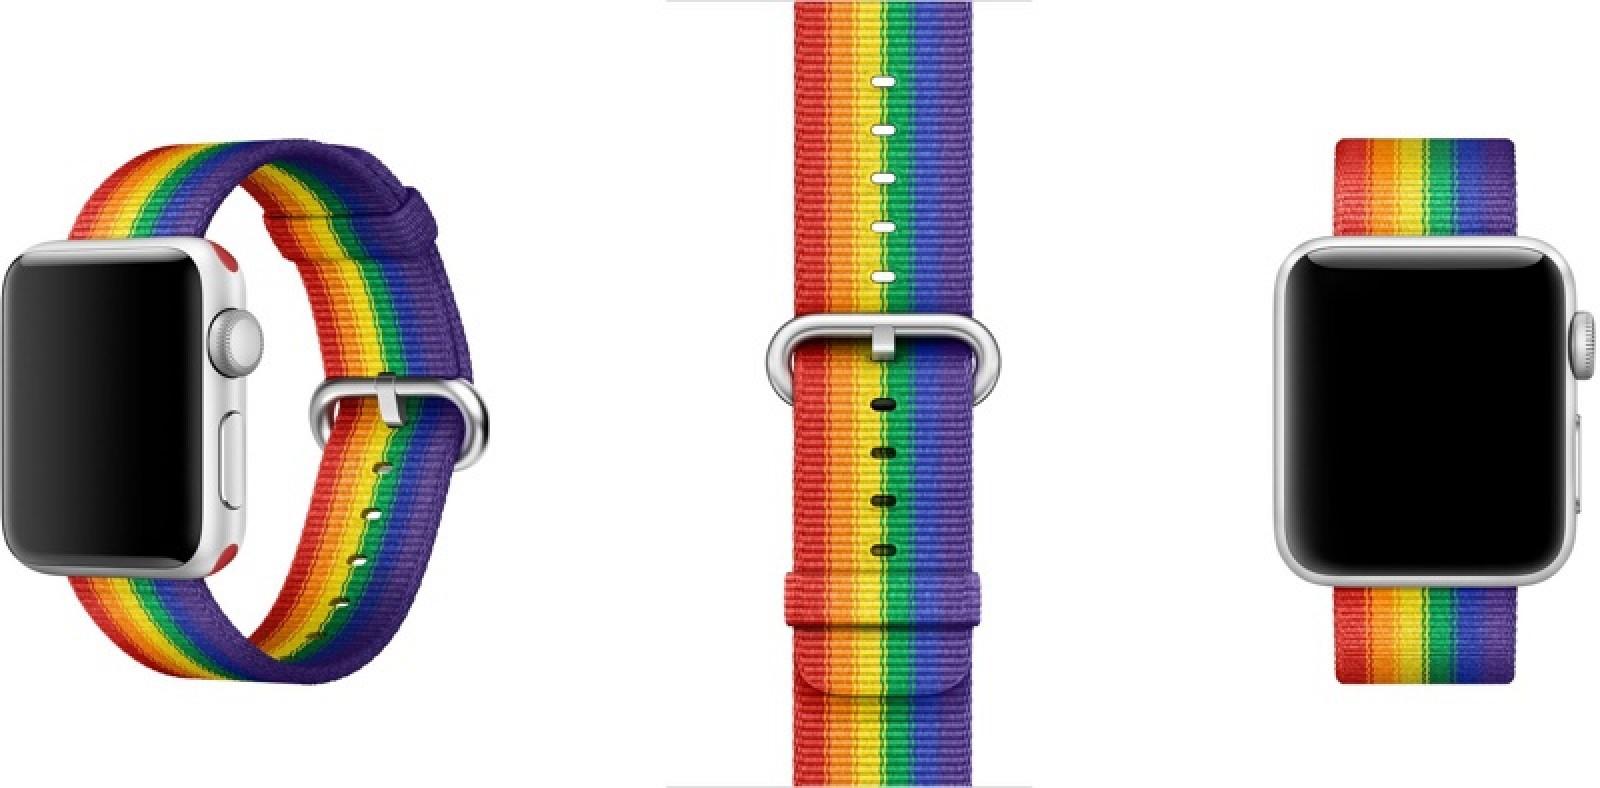 83a7ec82f3b8d9 Apple Debuts New Summer Apple Watch Bands